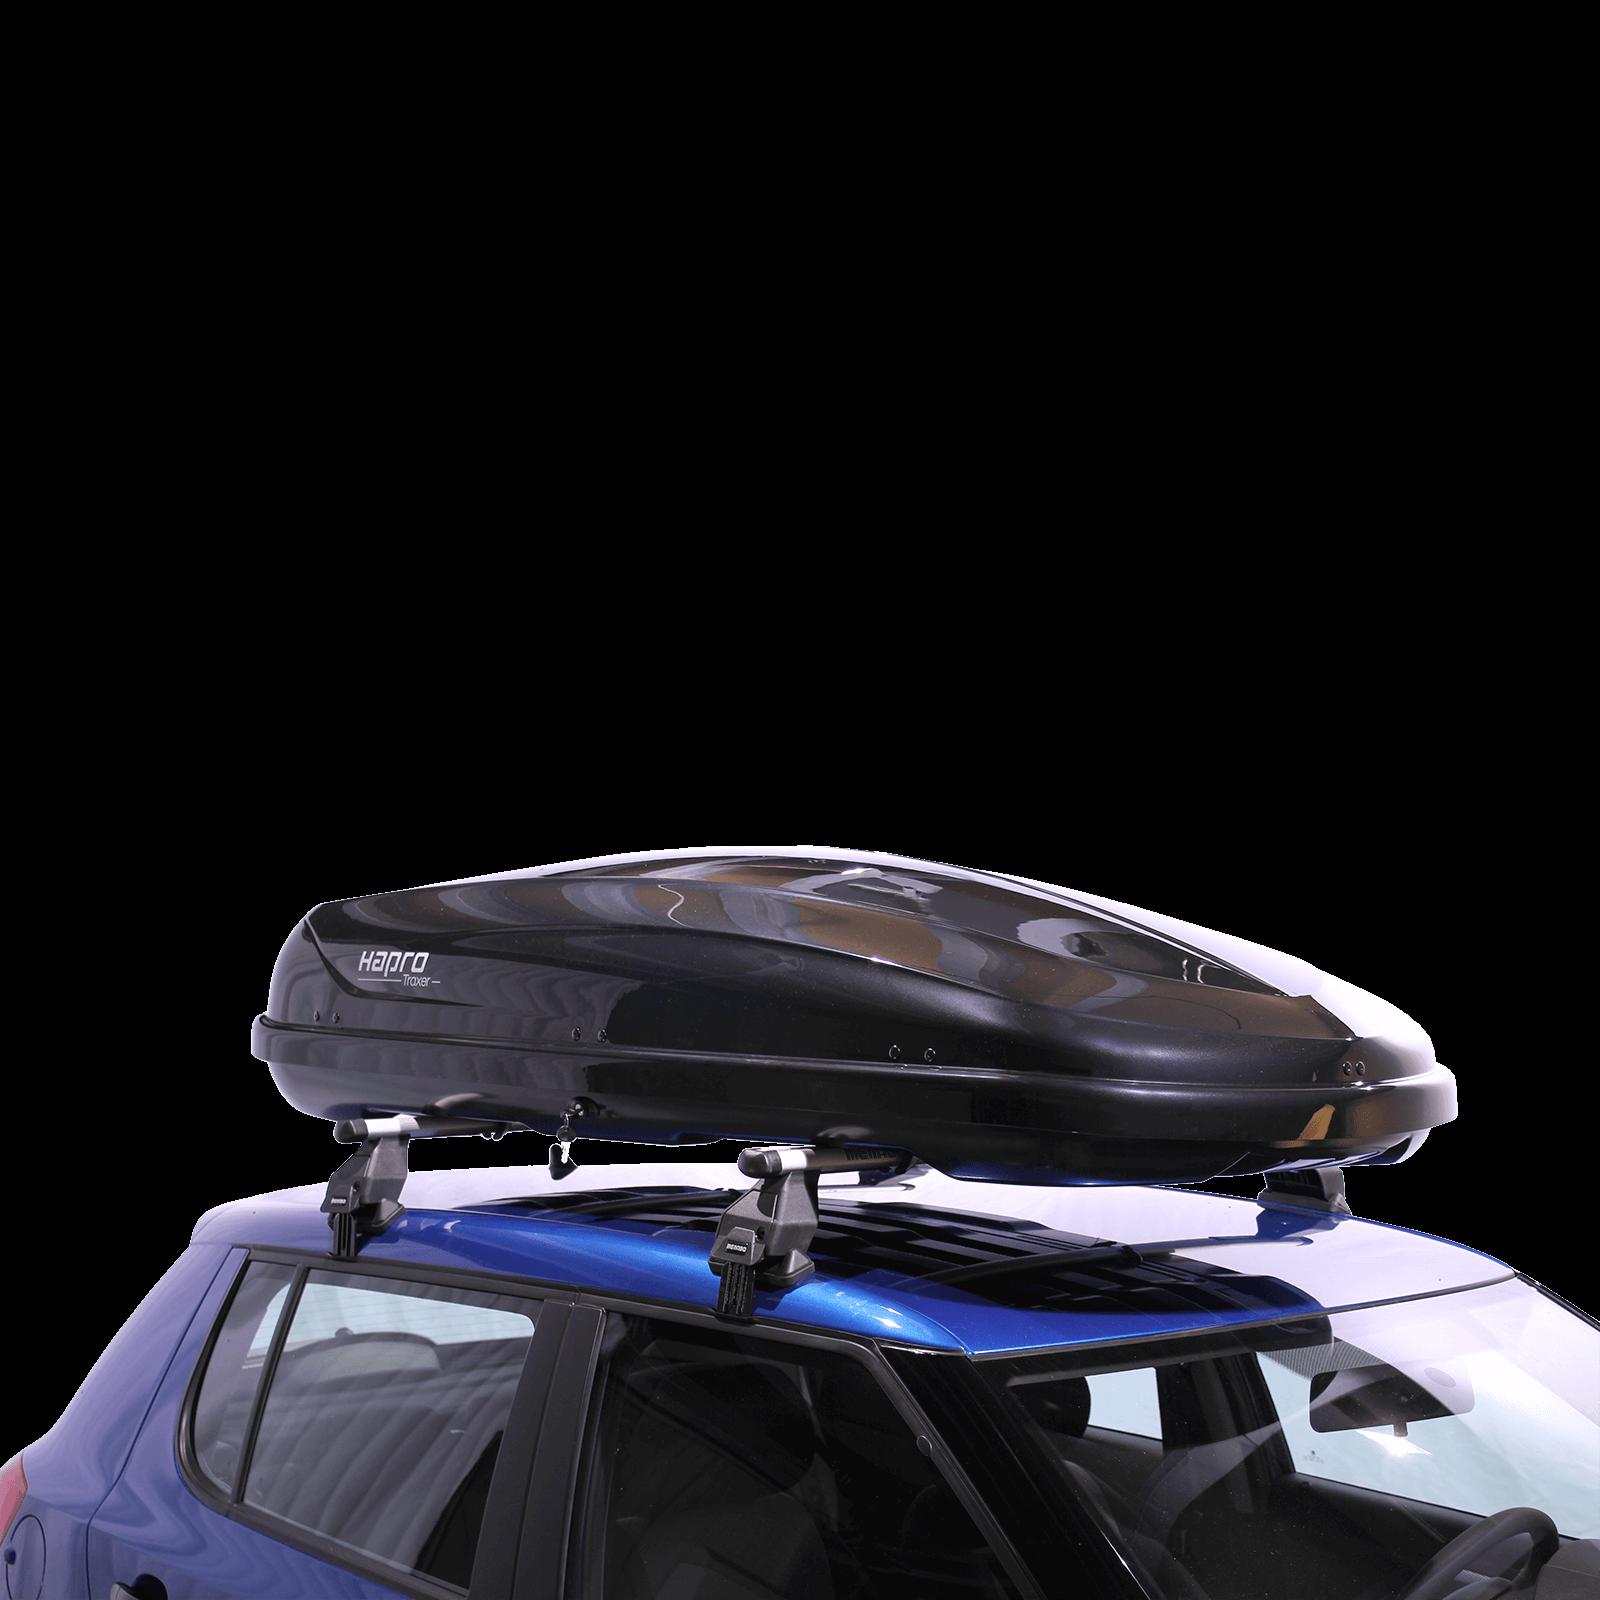 Dachbox Hapro Traxer 6.6 Brilliantblack - Bild 2